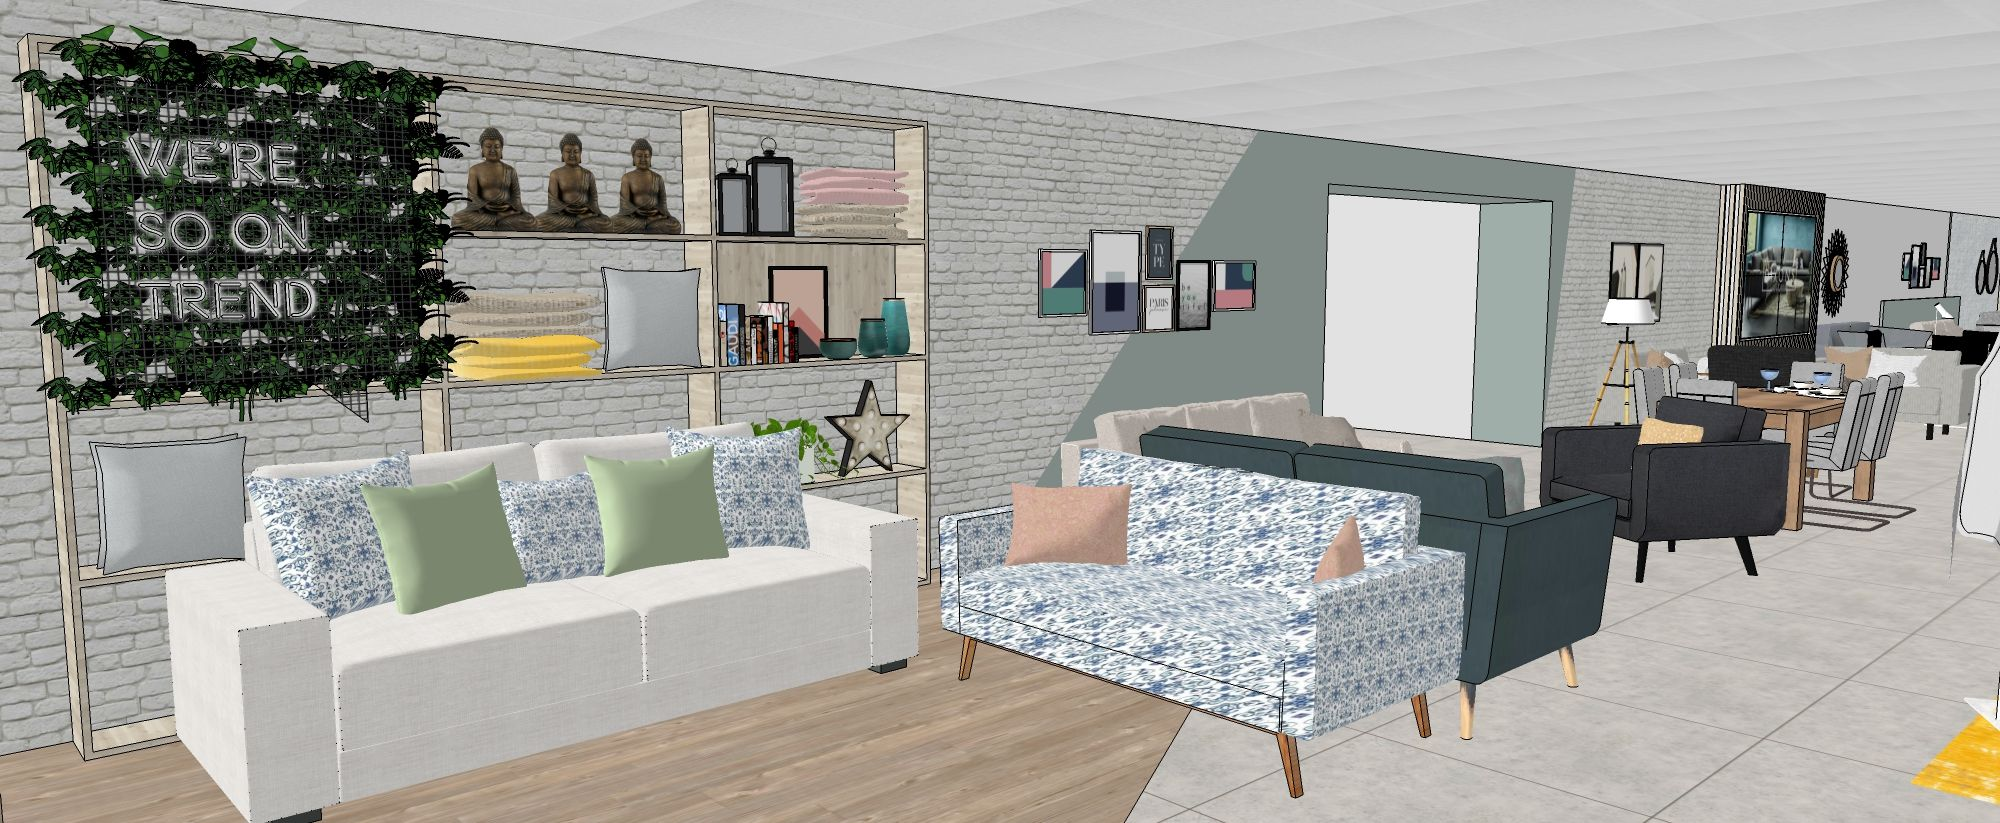 Retail design for Homestore. #retaildesign #homestore #retaildisplay #livingwall